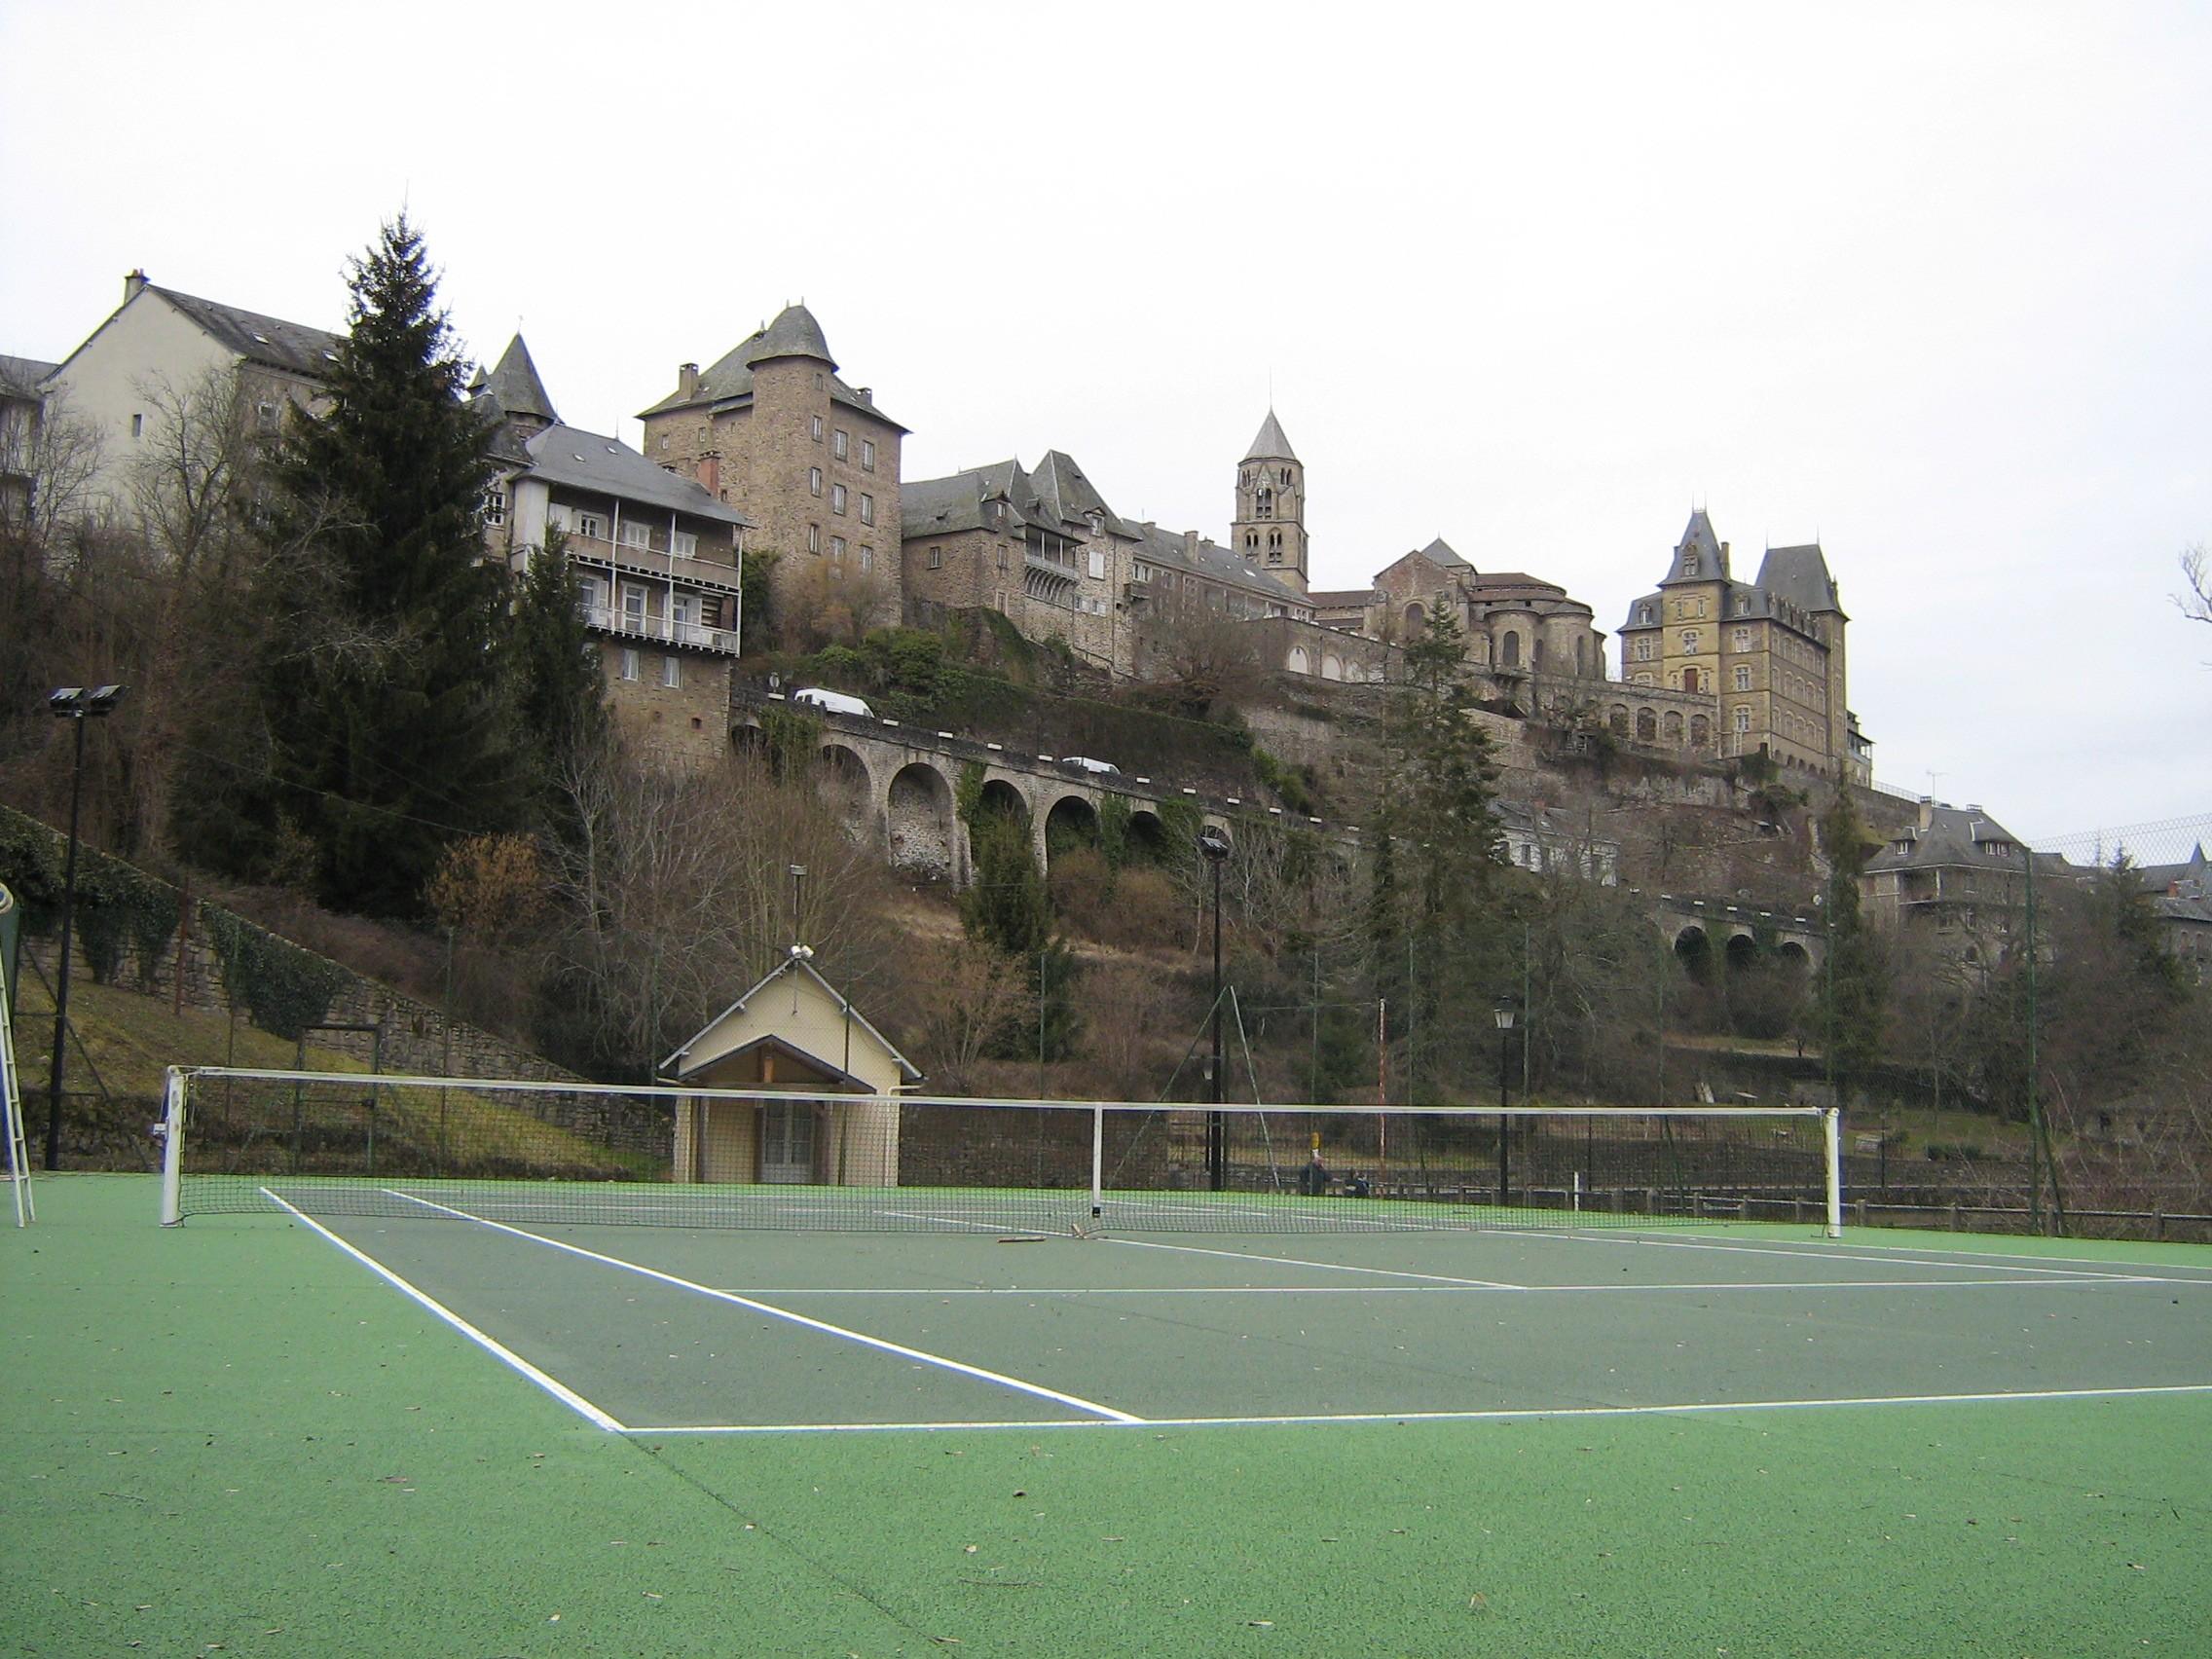 File:Uzerche et terrain de tennis.jpg - Wikimedia Commons